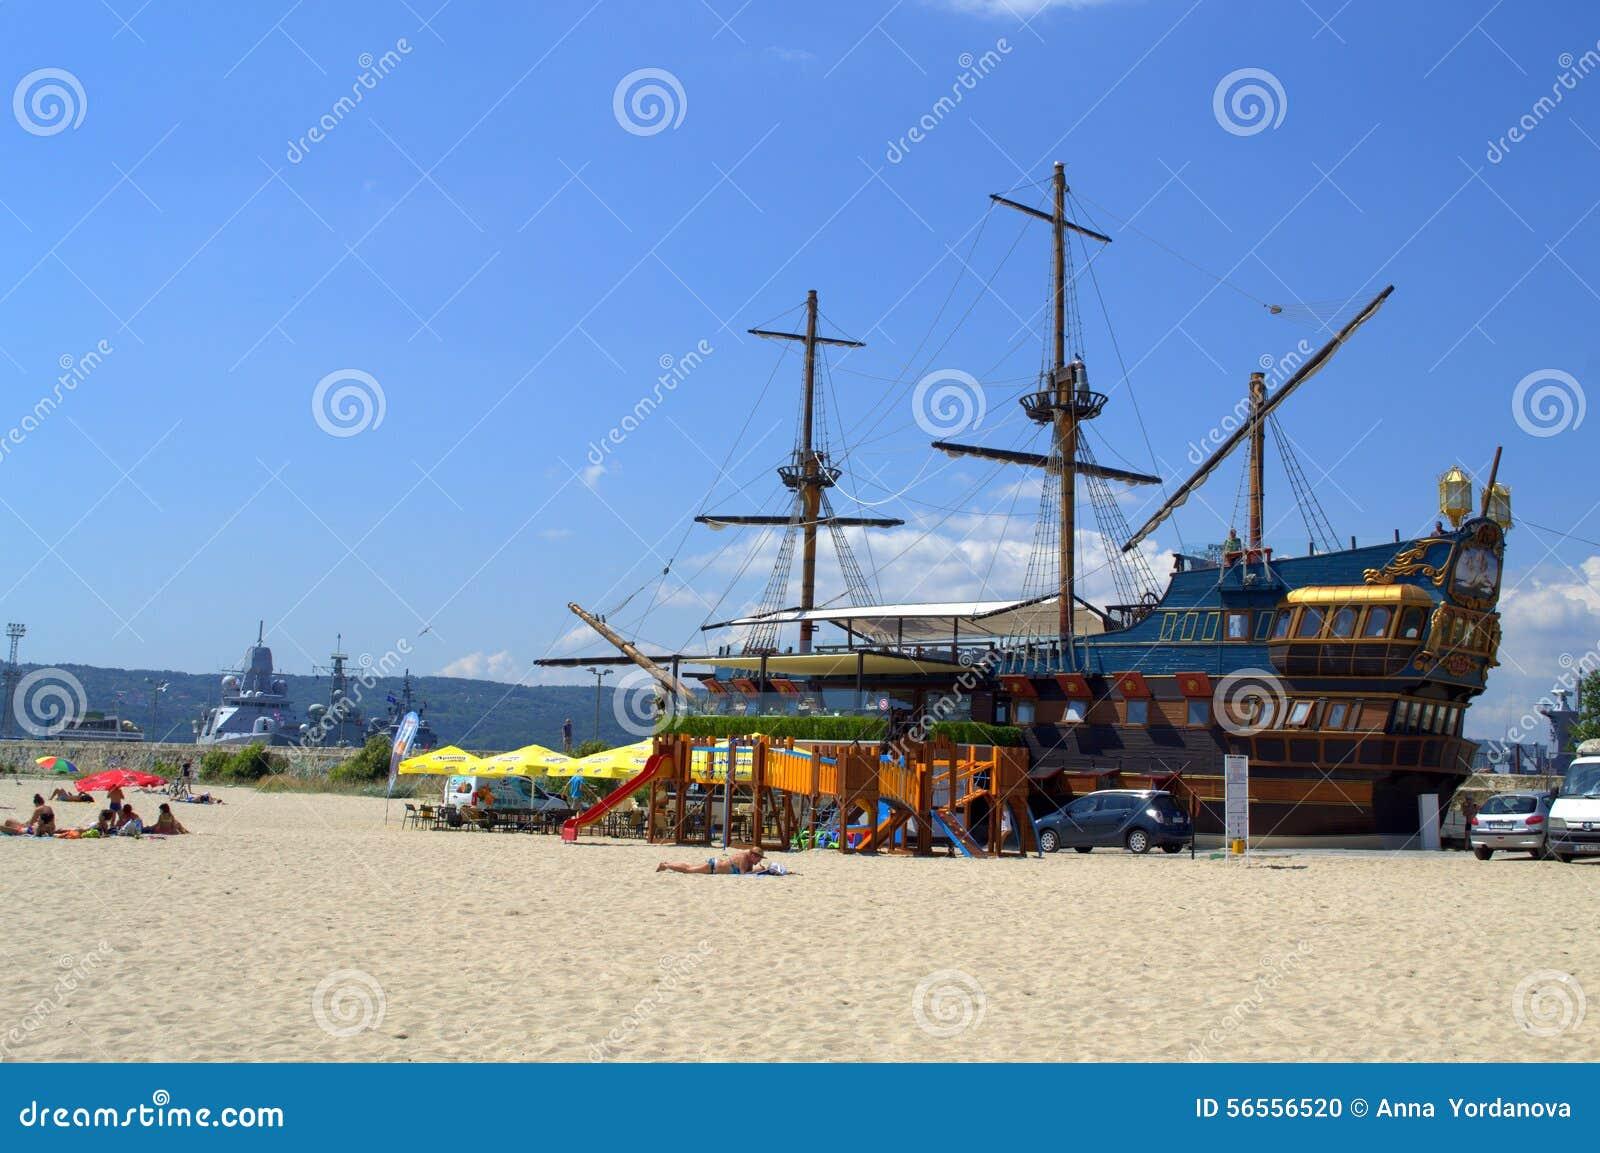 Download Ψηλό σκάφος στην παραλία της Βάρνας Εκδοτική εικόνα - εικόνα από αερακιού, φρεγάτες: 56556520